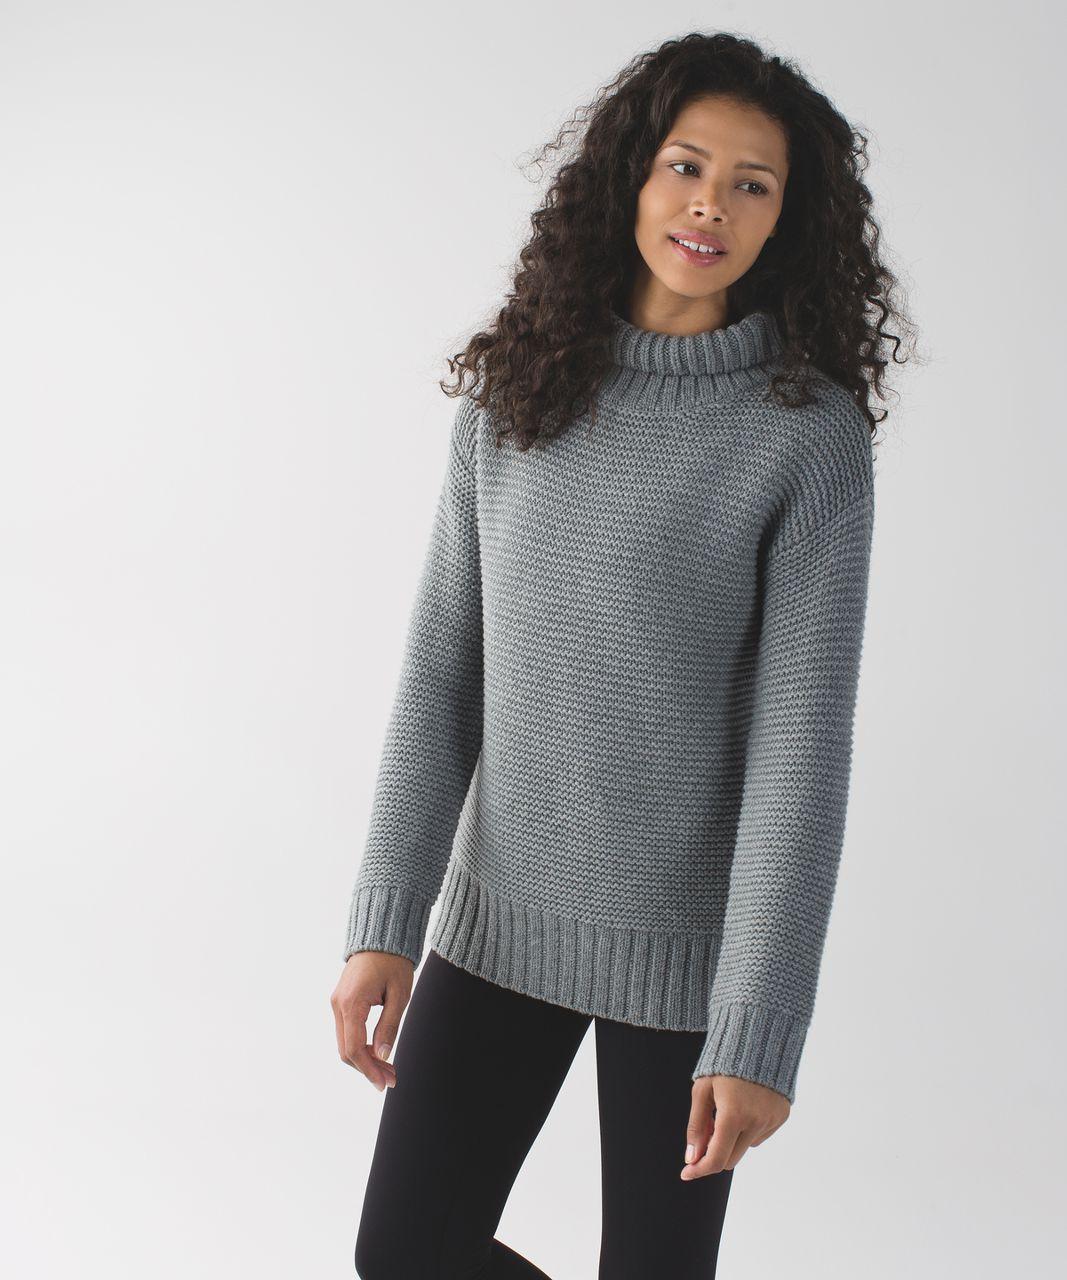 Lululemon Karma Kurmasana Sweater - Heathered Medium Grey